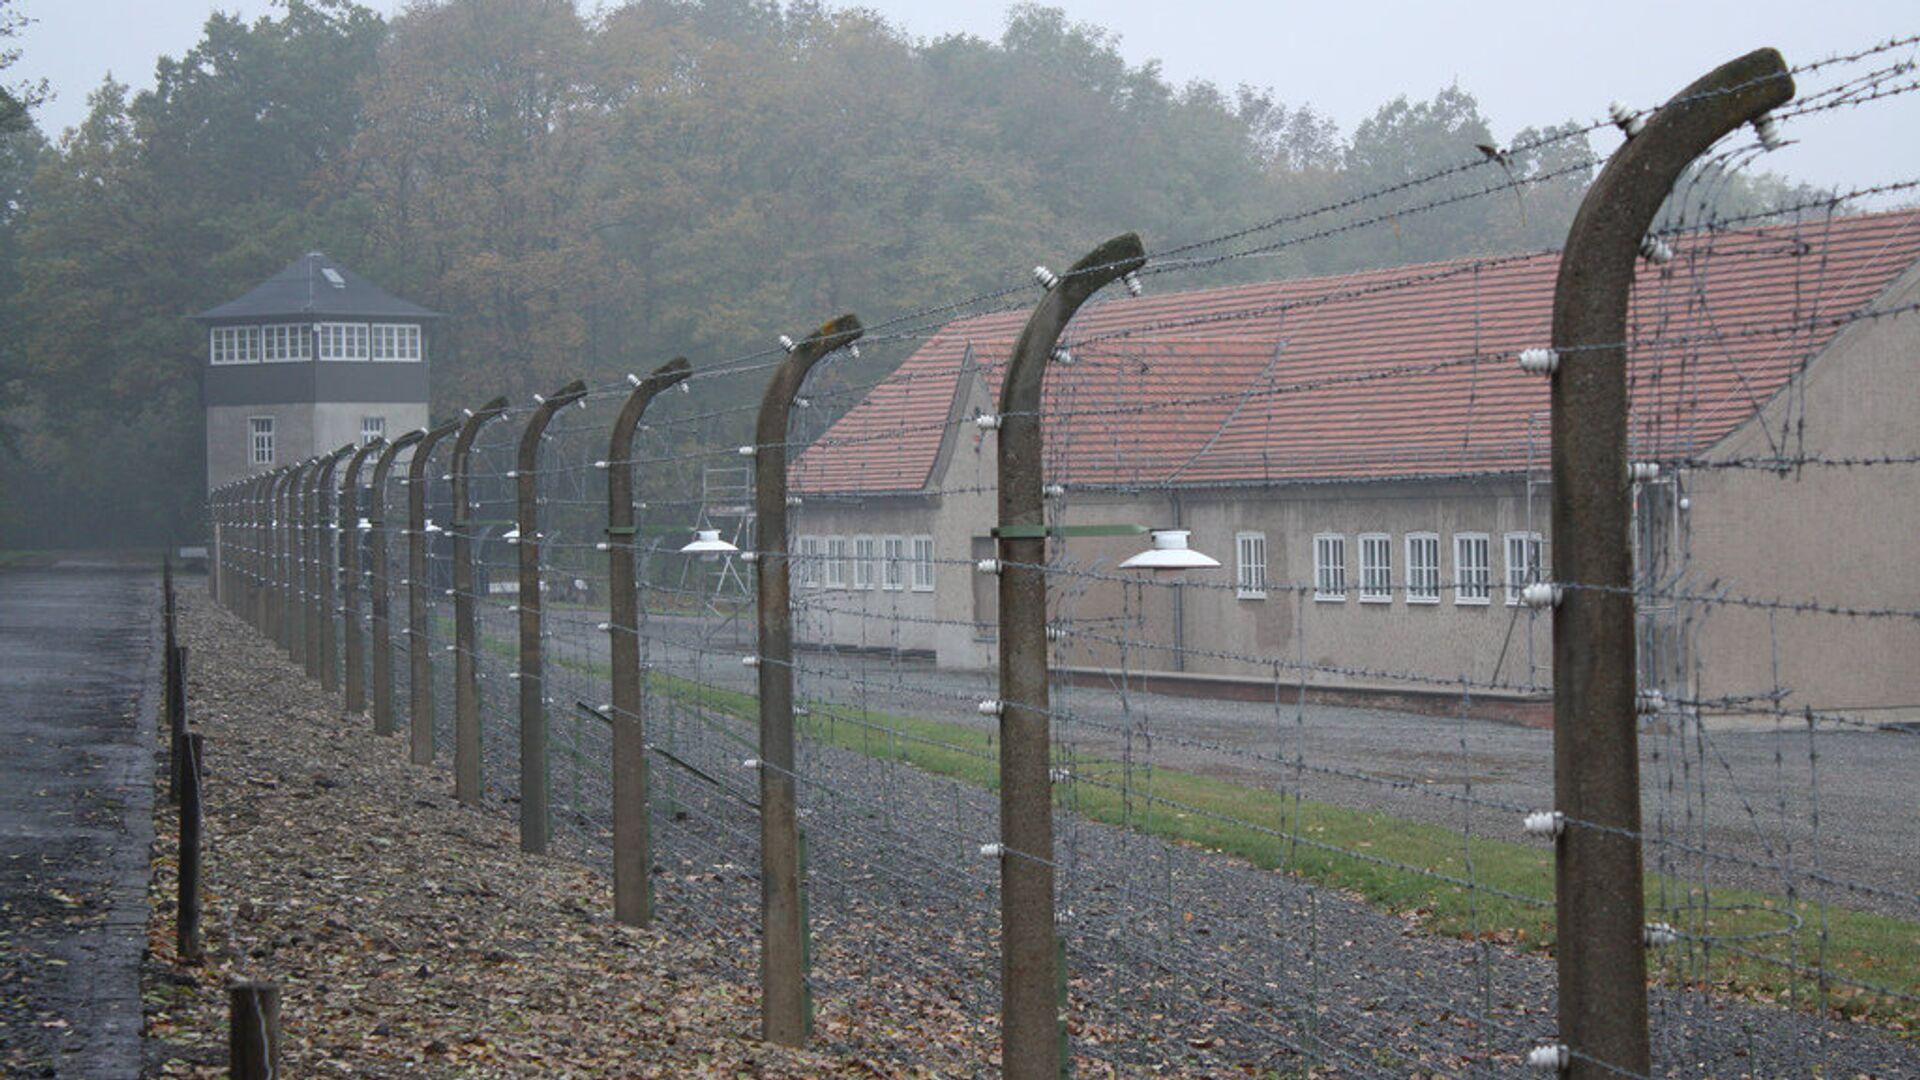 Buchenwald - Sputnik Italia, 1920, 05.08.2021